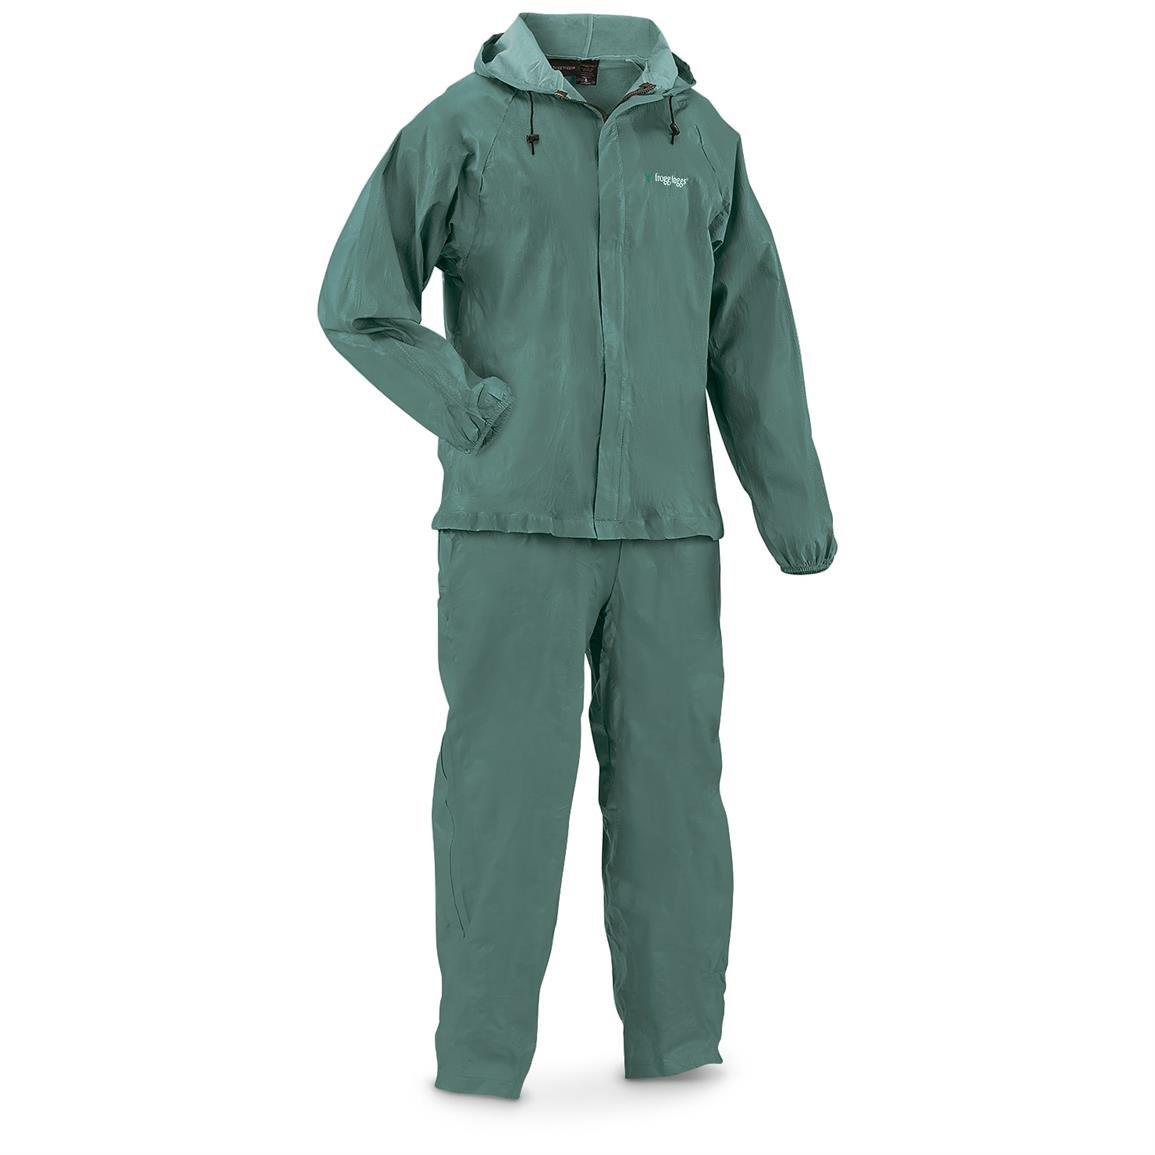 Frogg Toggs Men's Waterproof Ultra-Lite2 Suit, Forest Green, M